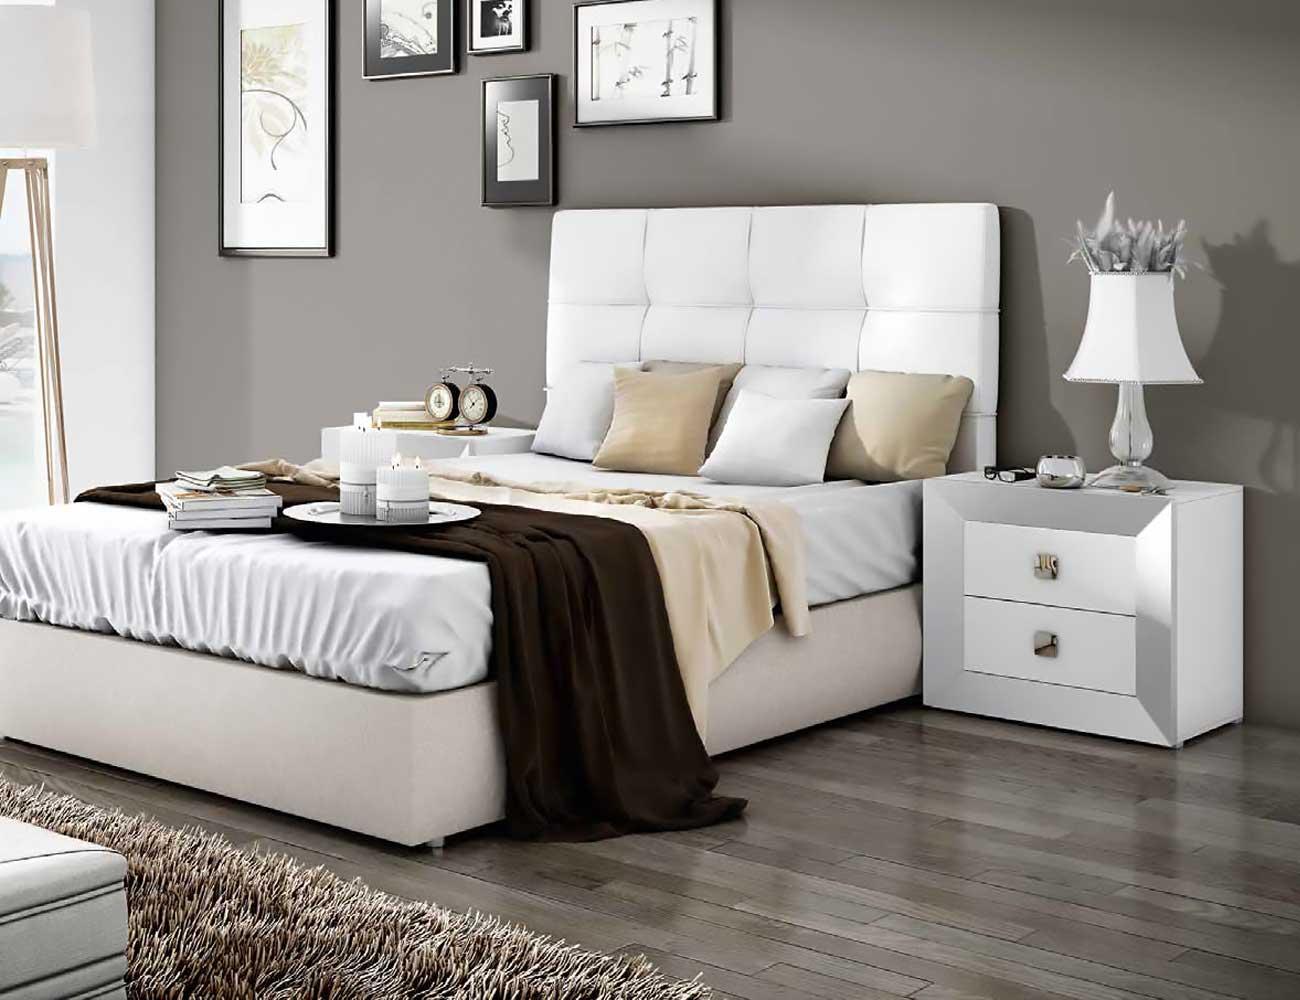 Dormitorio de matrimonio moderno con cabecero en polipiel - Dormitorios blancos modernos ...